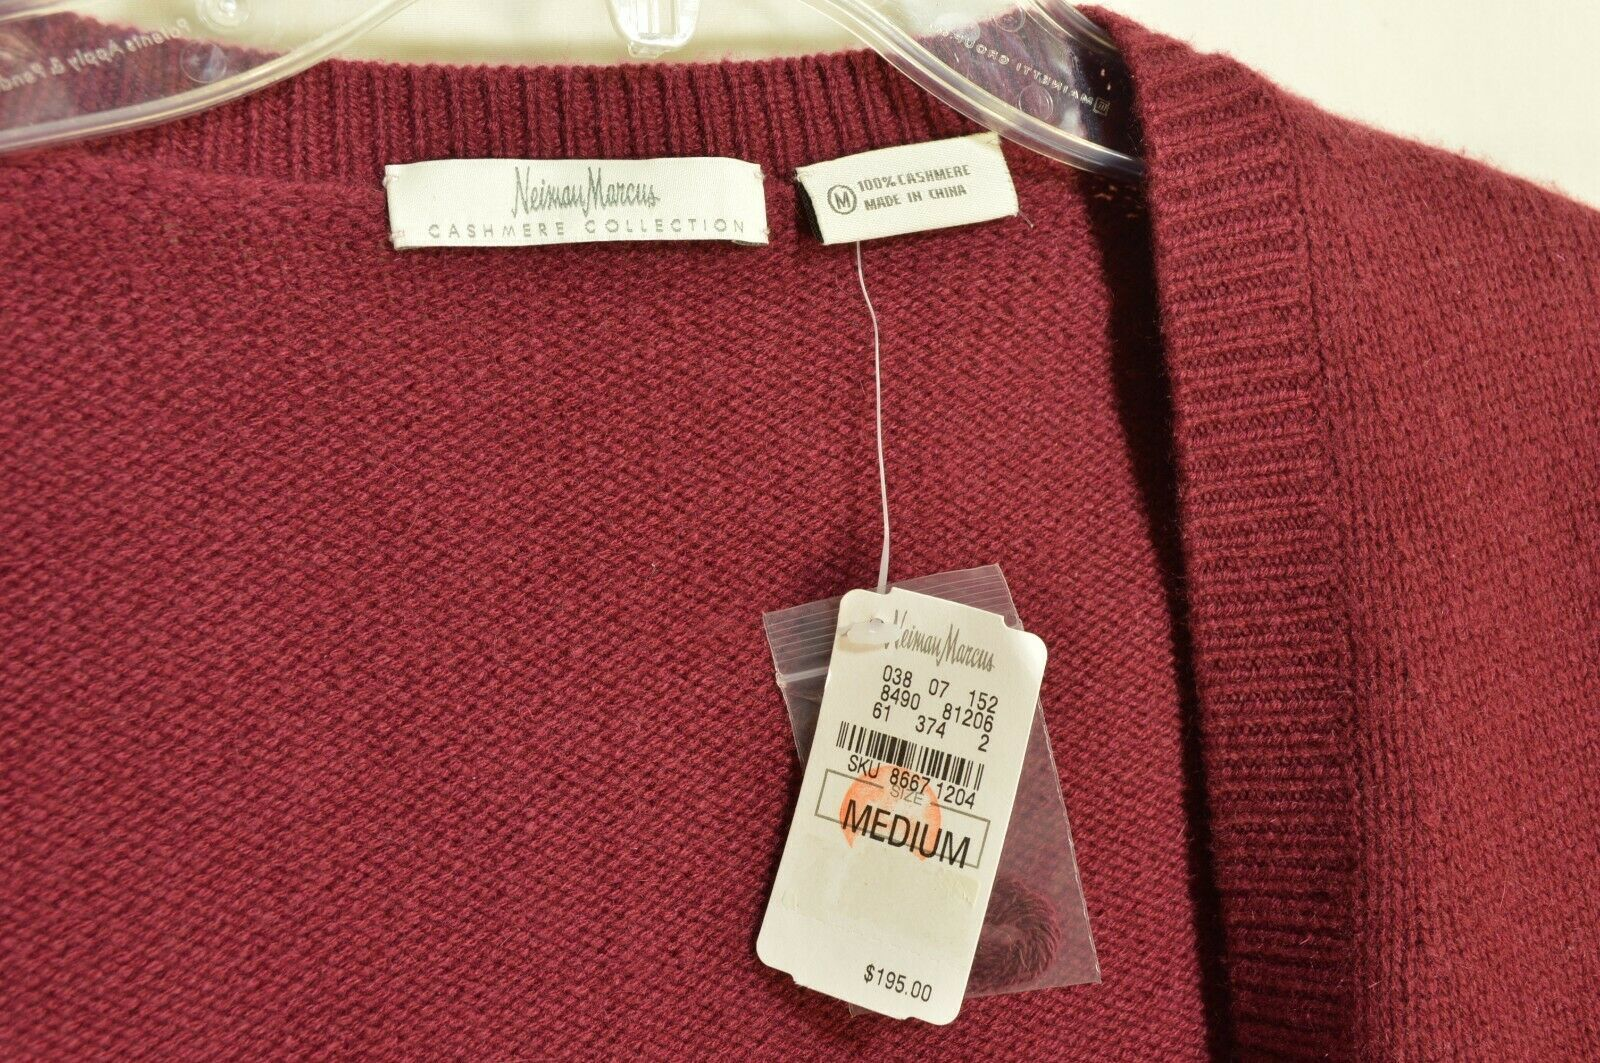 Neiman Marcus sweater M NWT red 100% cashmere shrug bolero cropped $195 new image 6